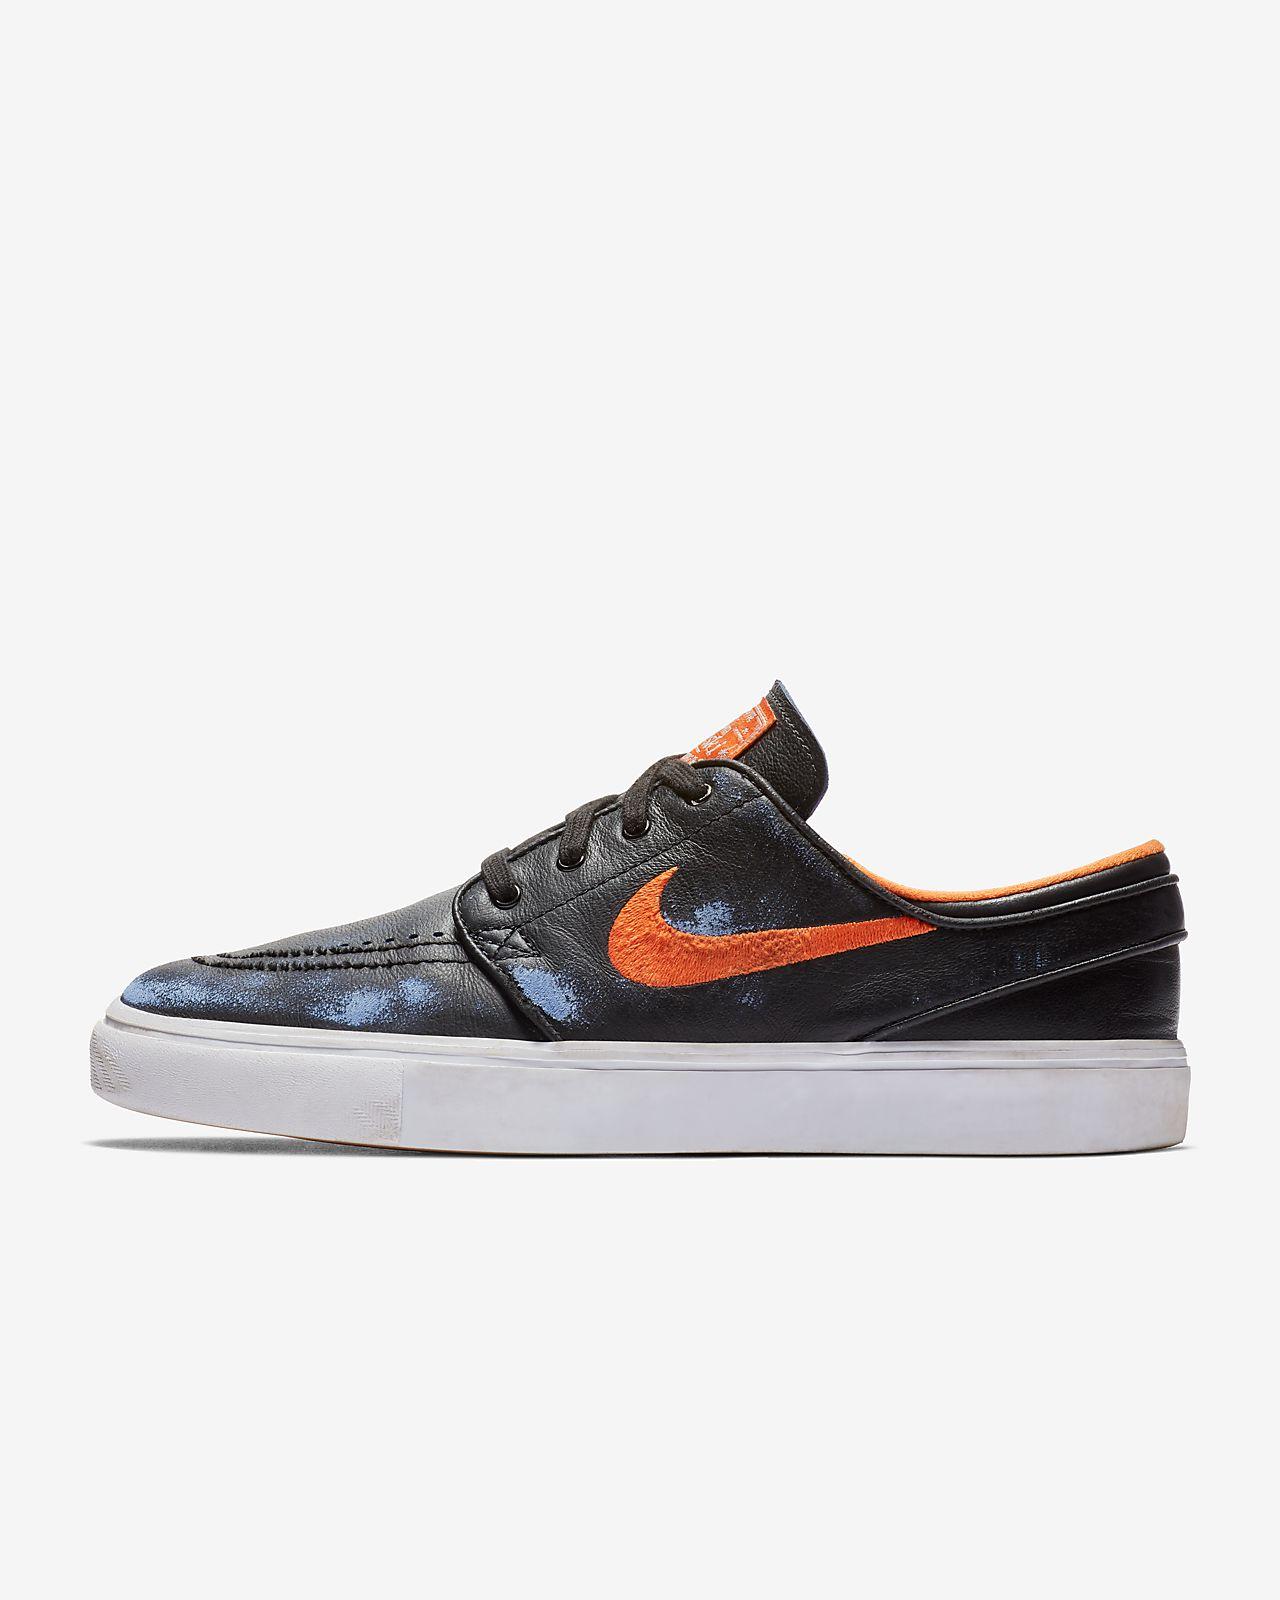 timeless design a2d4b f7440 ... Nike SB Zoom Janoski NBA Men s Skate Shoe